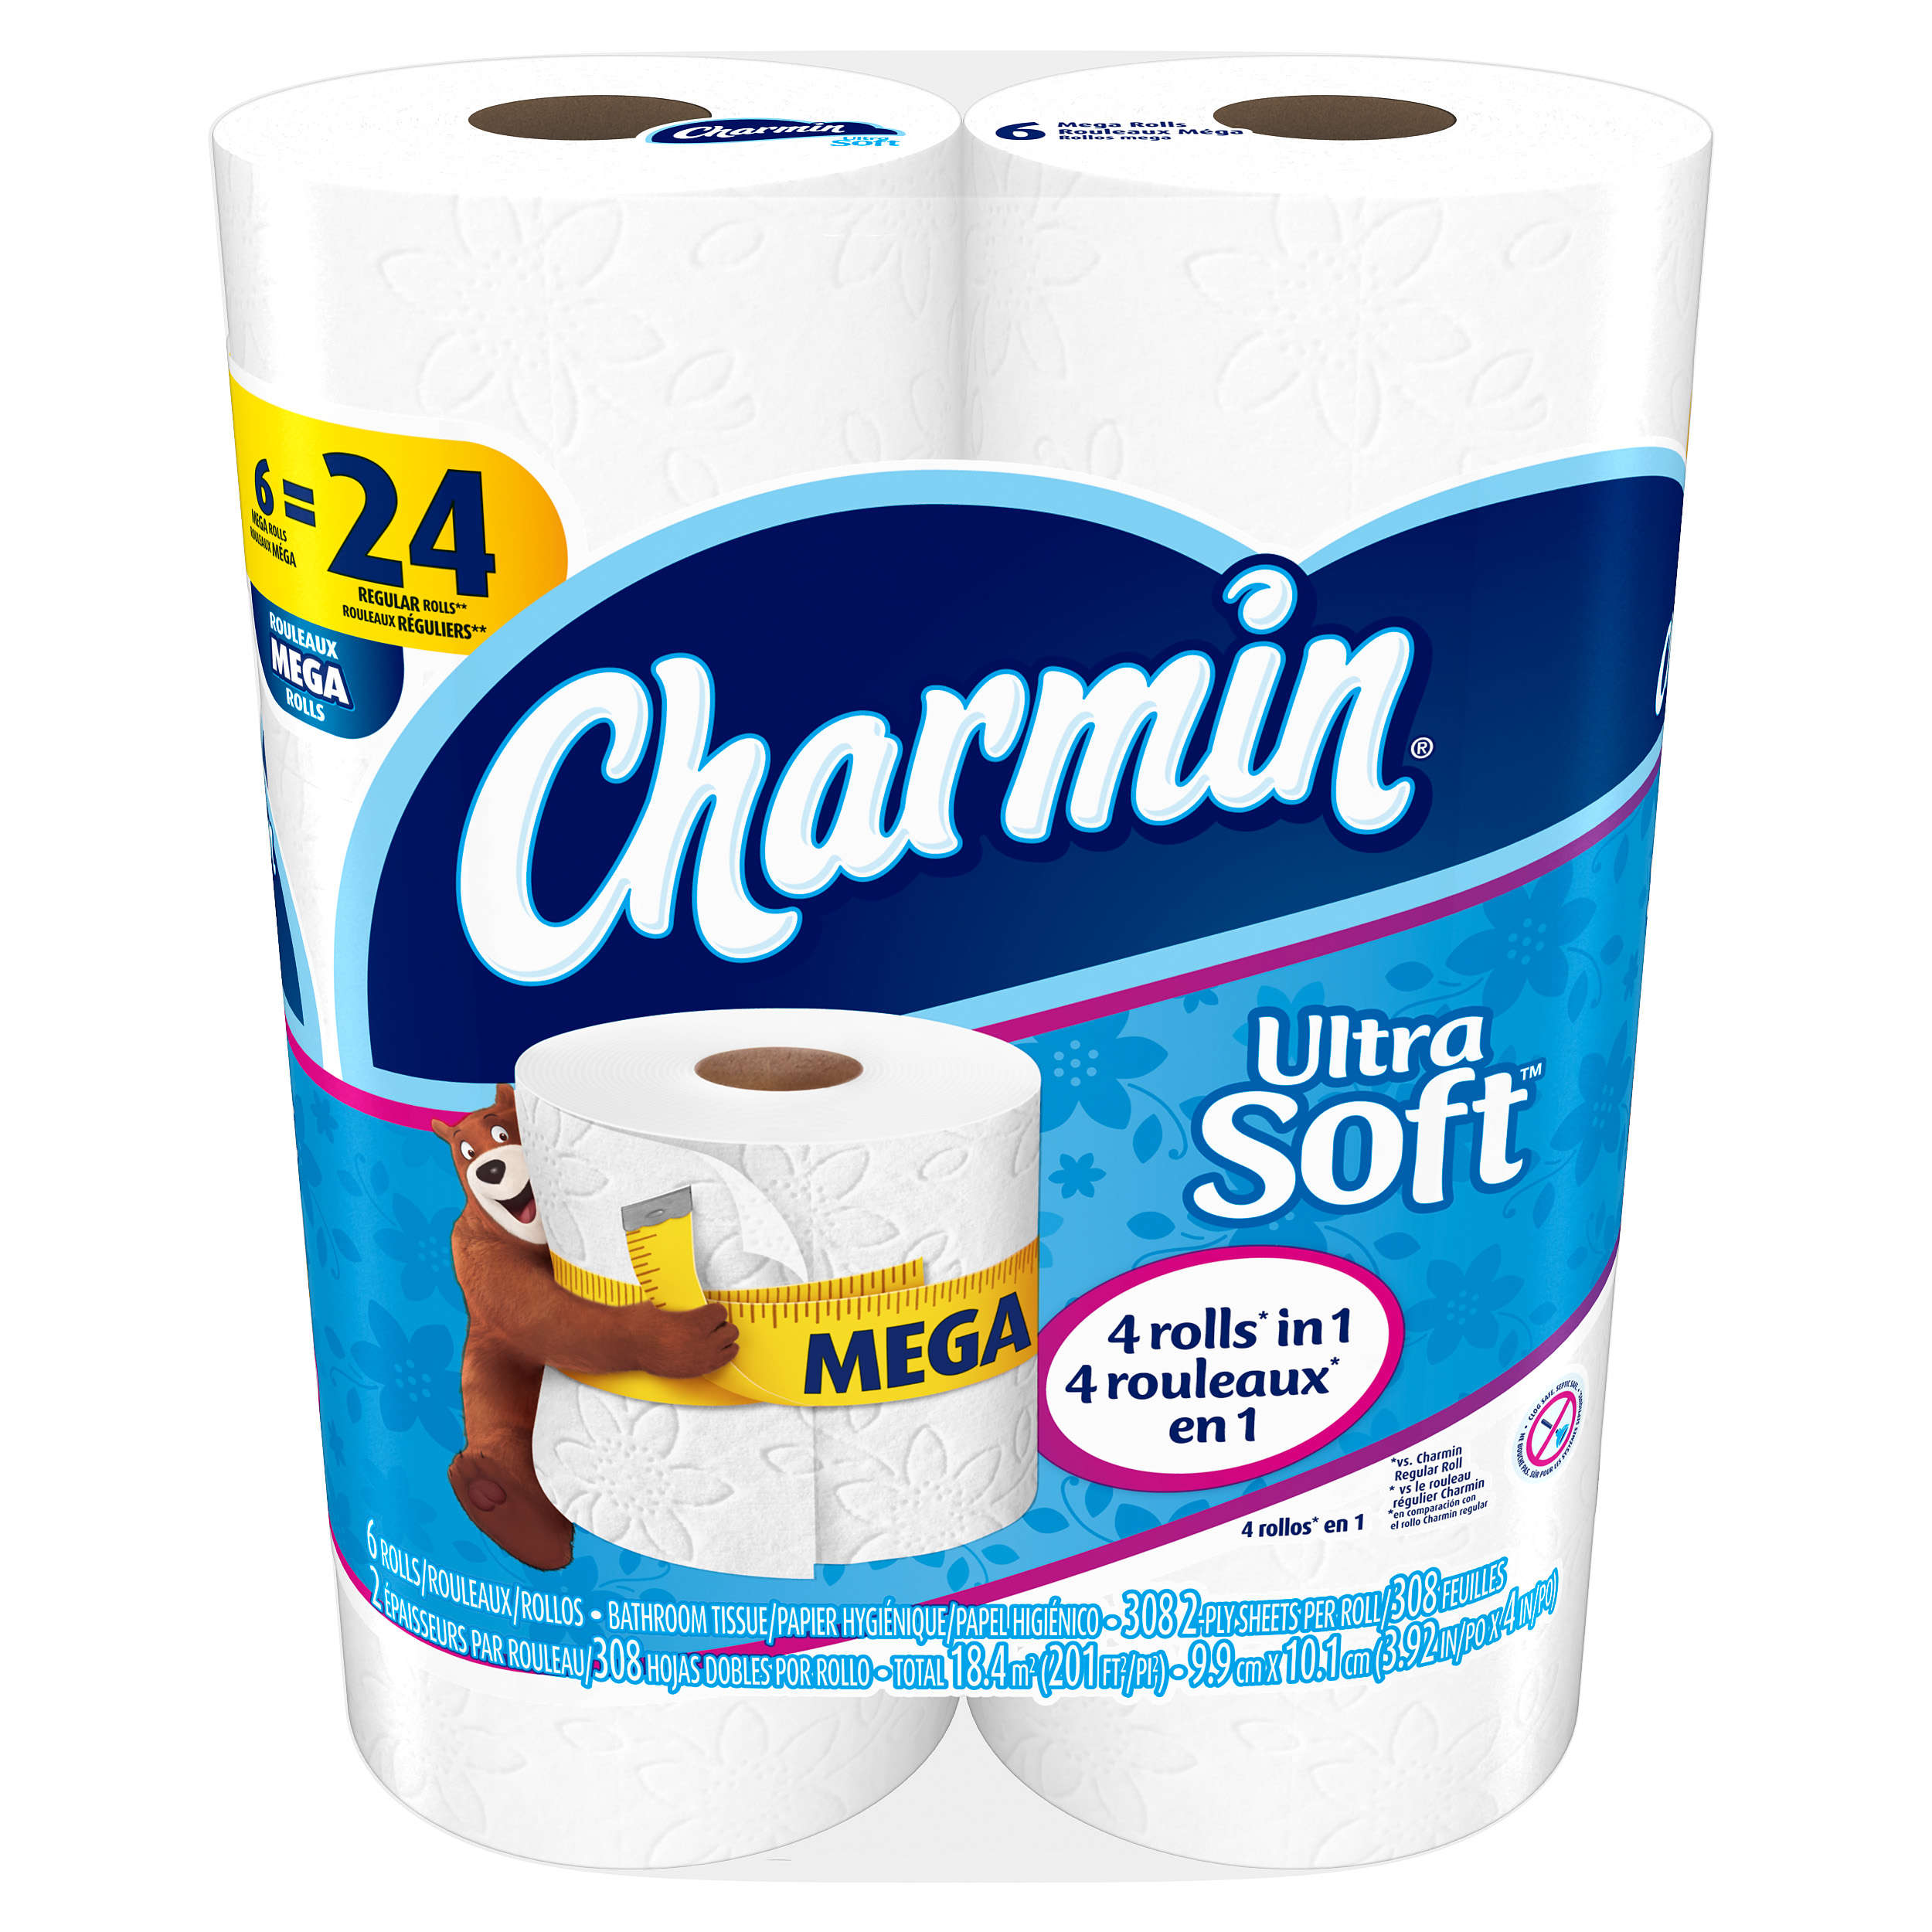 Charmin Ultra Soft Toilet Paper 6 Mega Rolls